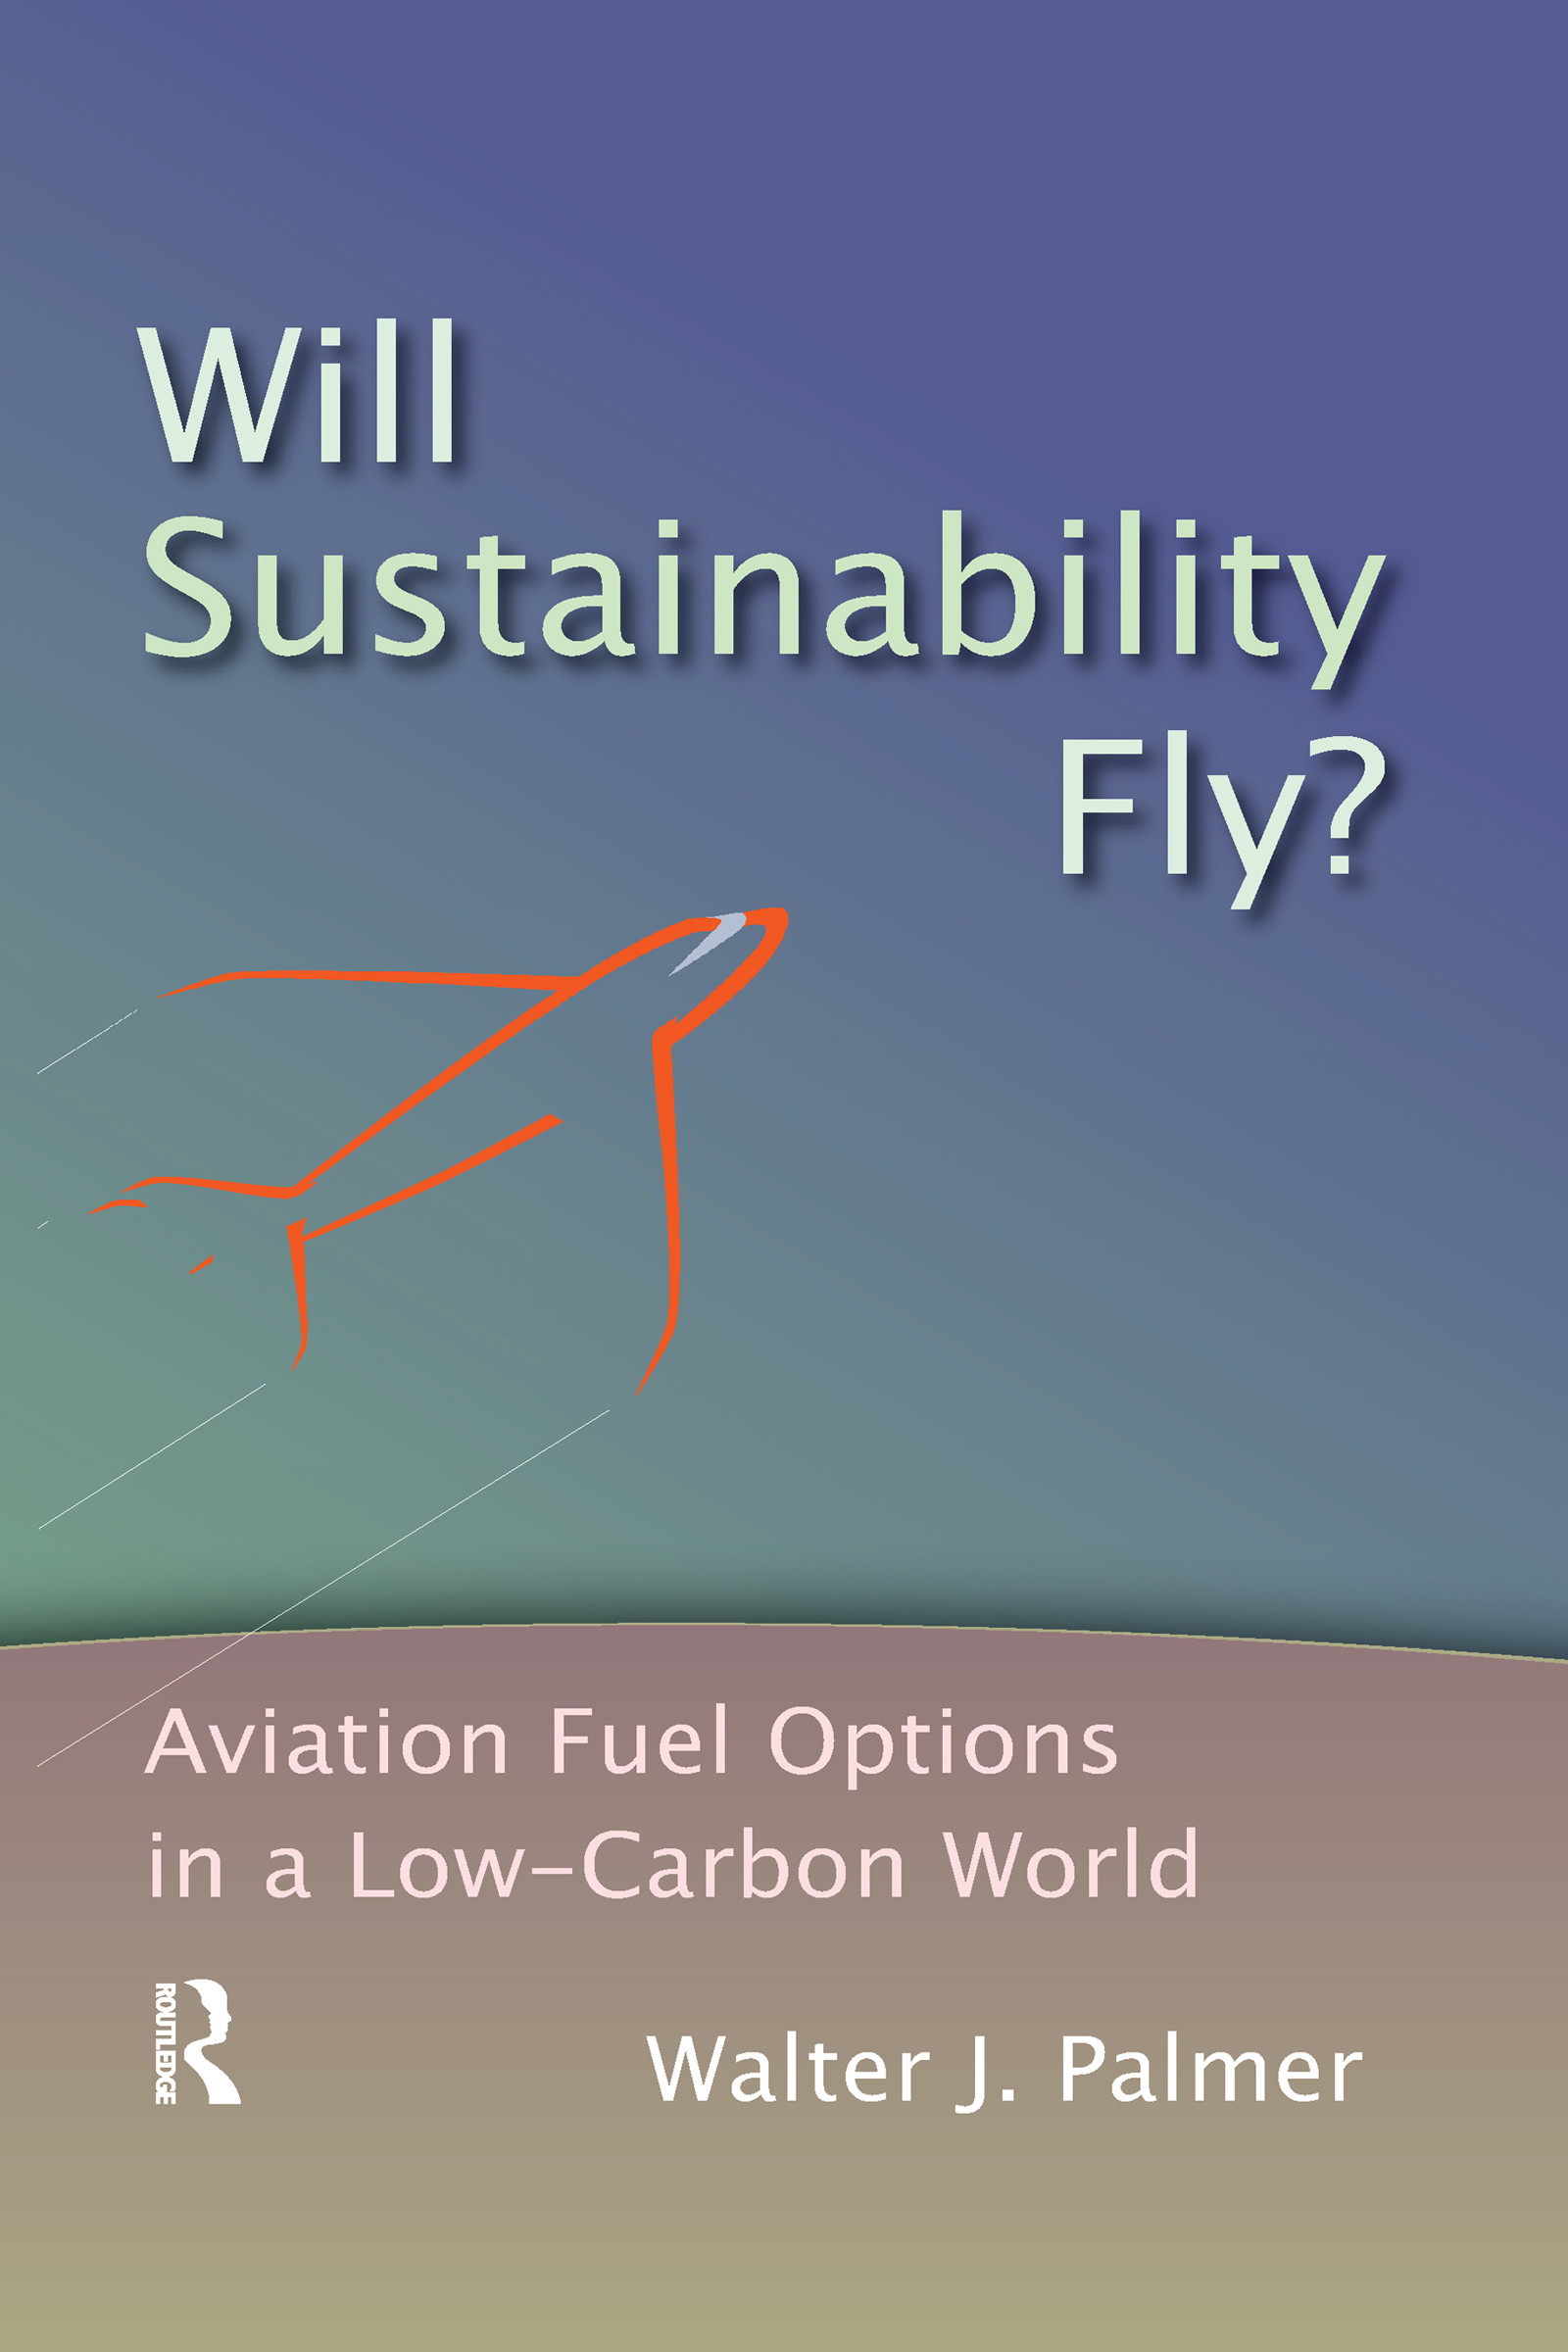 Will Sustainability Fly?